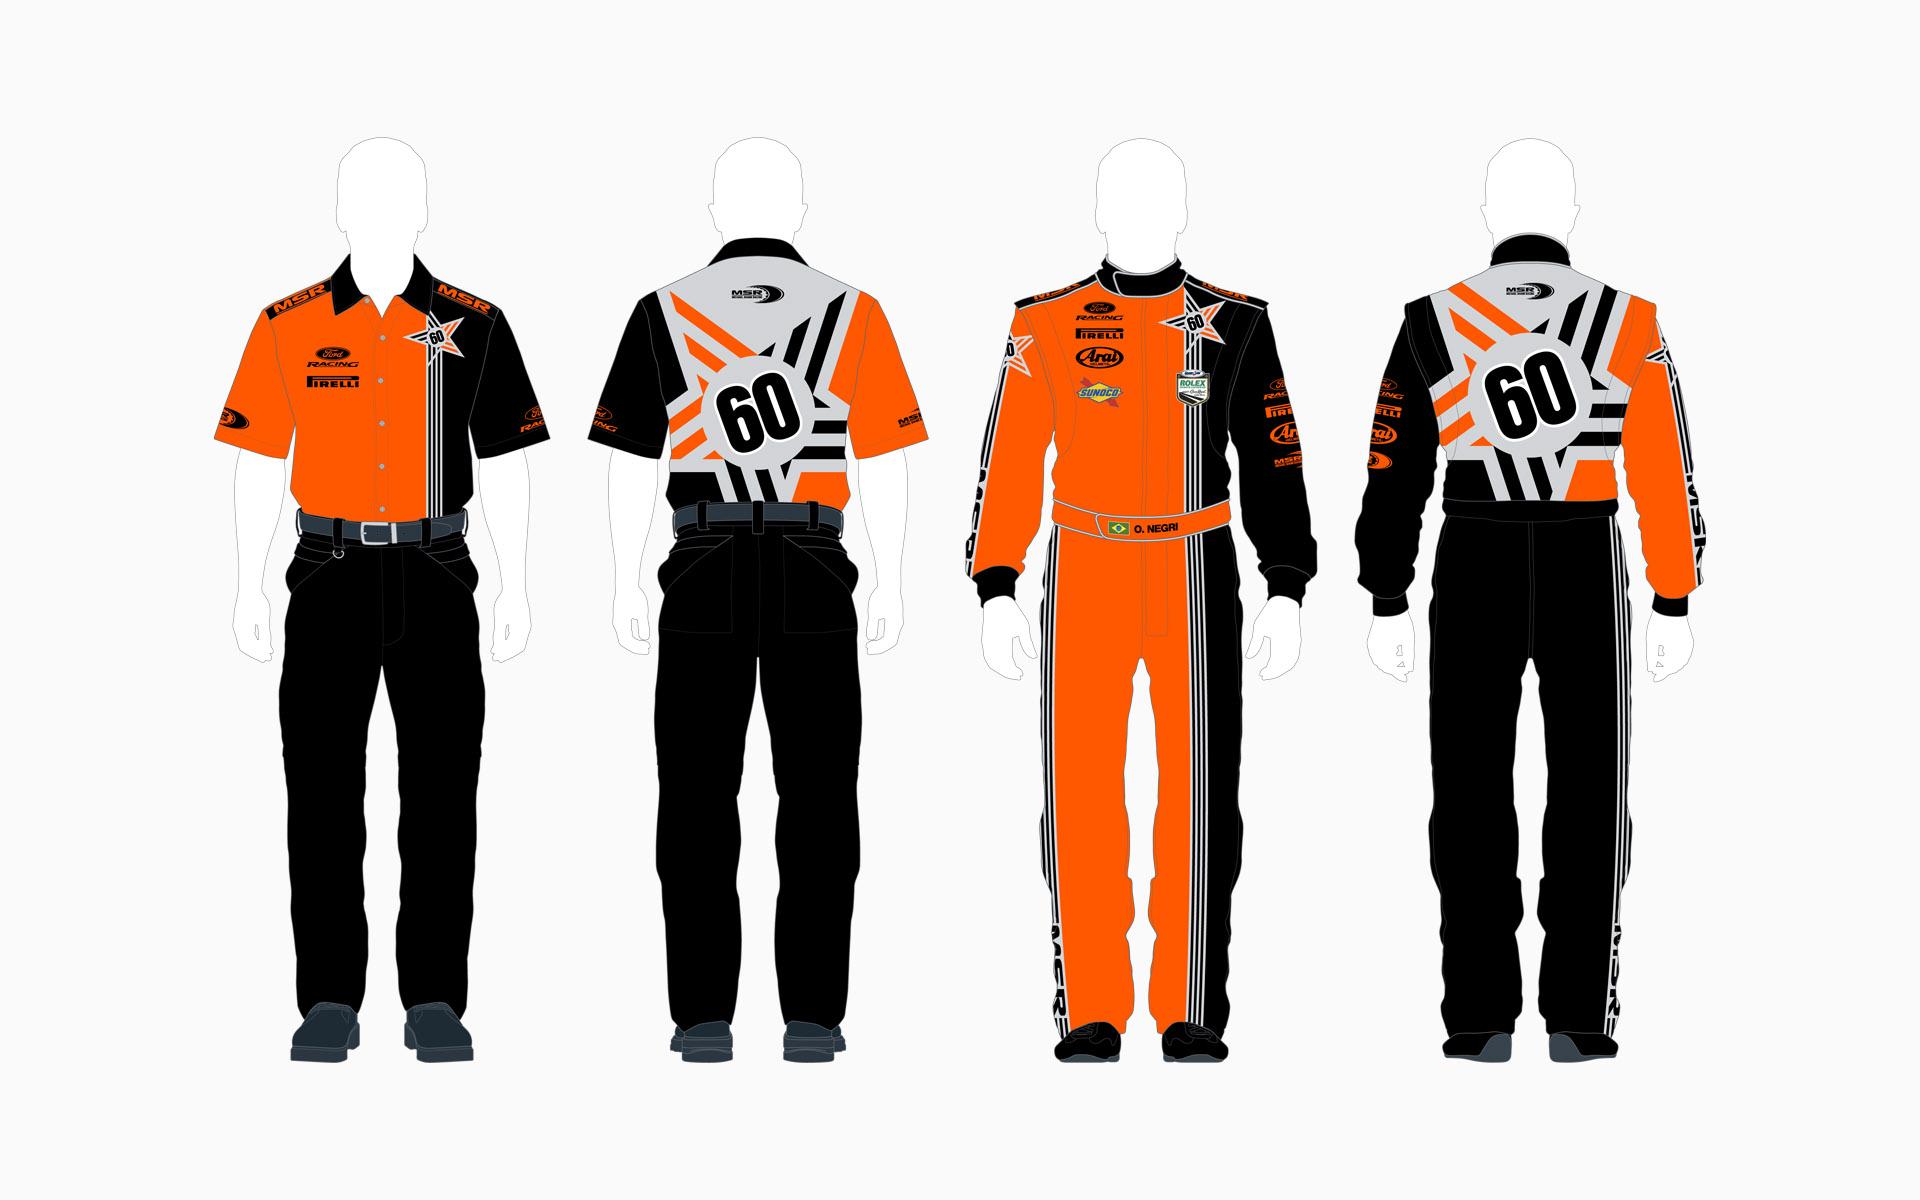 2006 Michael Shank Racing Crew Shirt and Firesuit